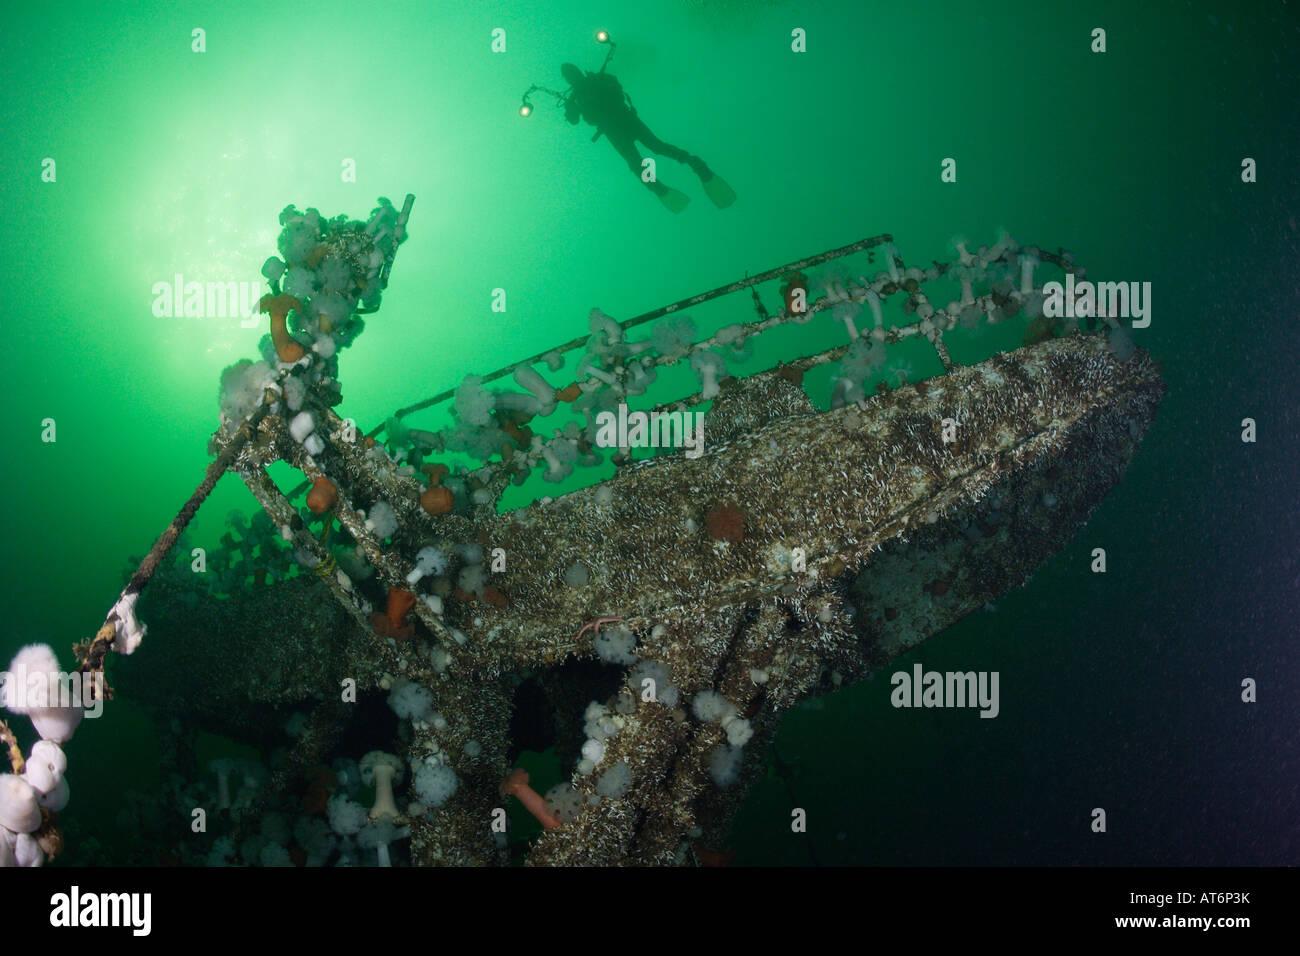 nx0322. scuba diver (model released) explores HMCS Saskatchewan shipwreck.British Columbia, Canada. Photo Copyright - Stock Image